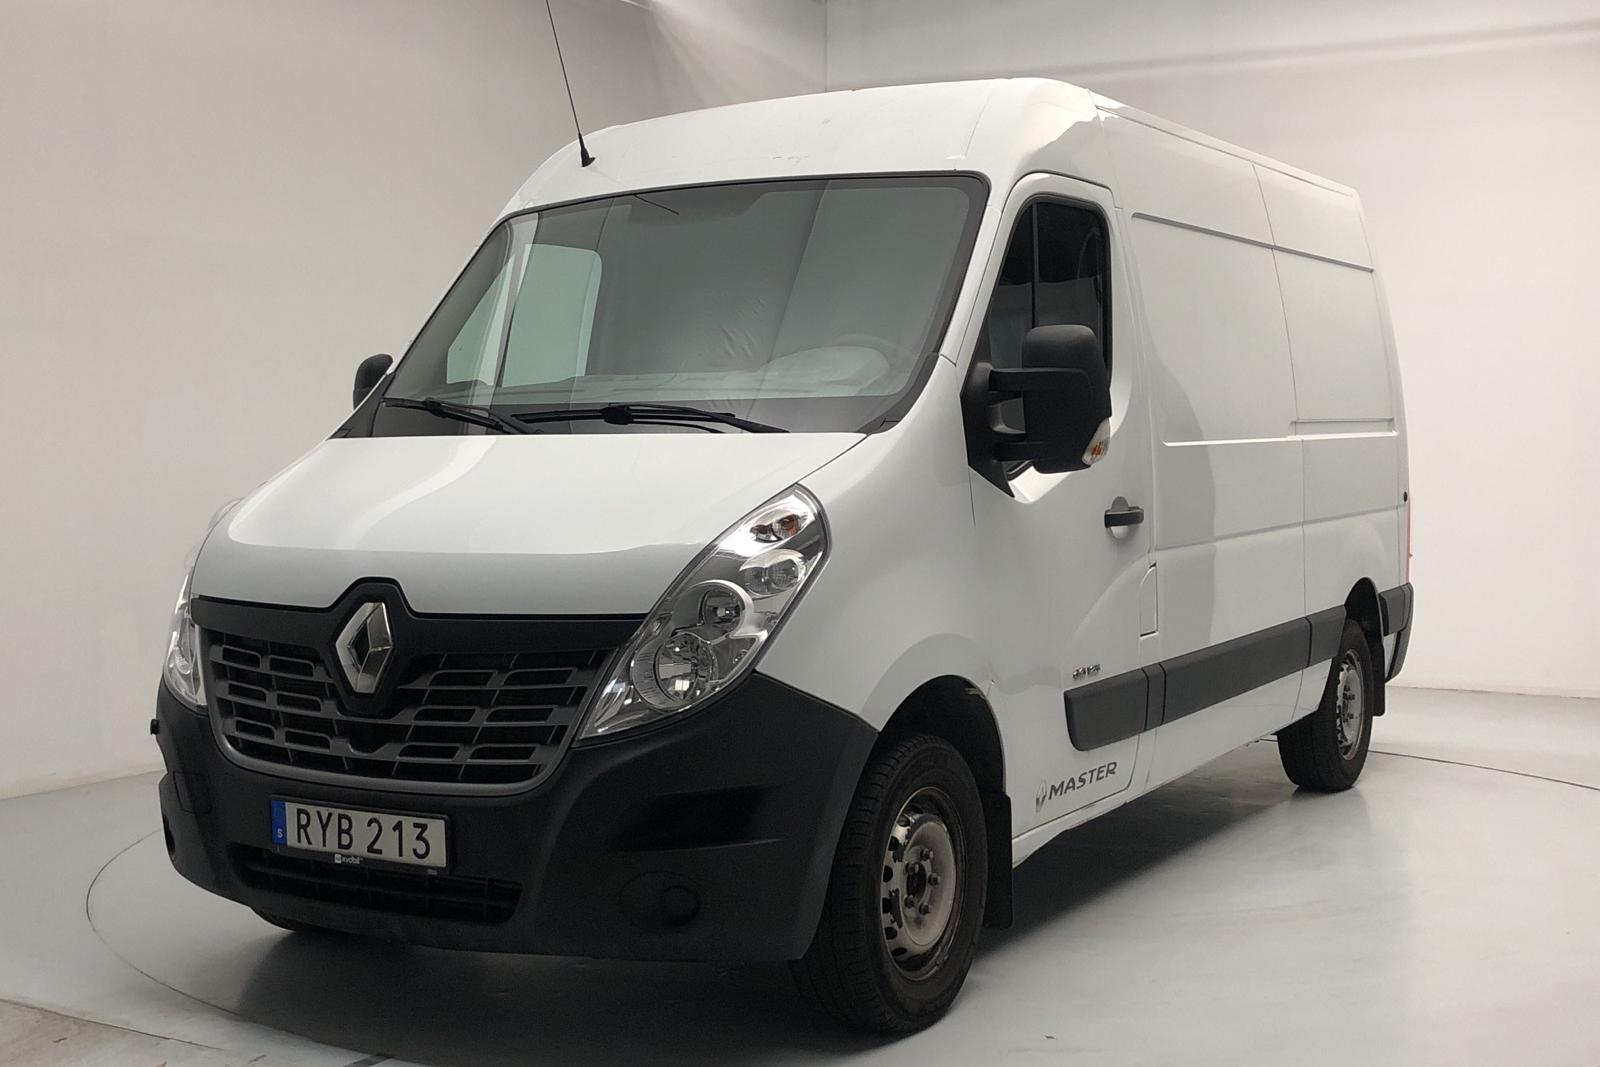 Renault Master 2.3 dCi FAP 2WD (125hk) - 6 006 mil - Manuell - vit - 2016